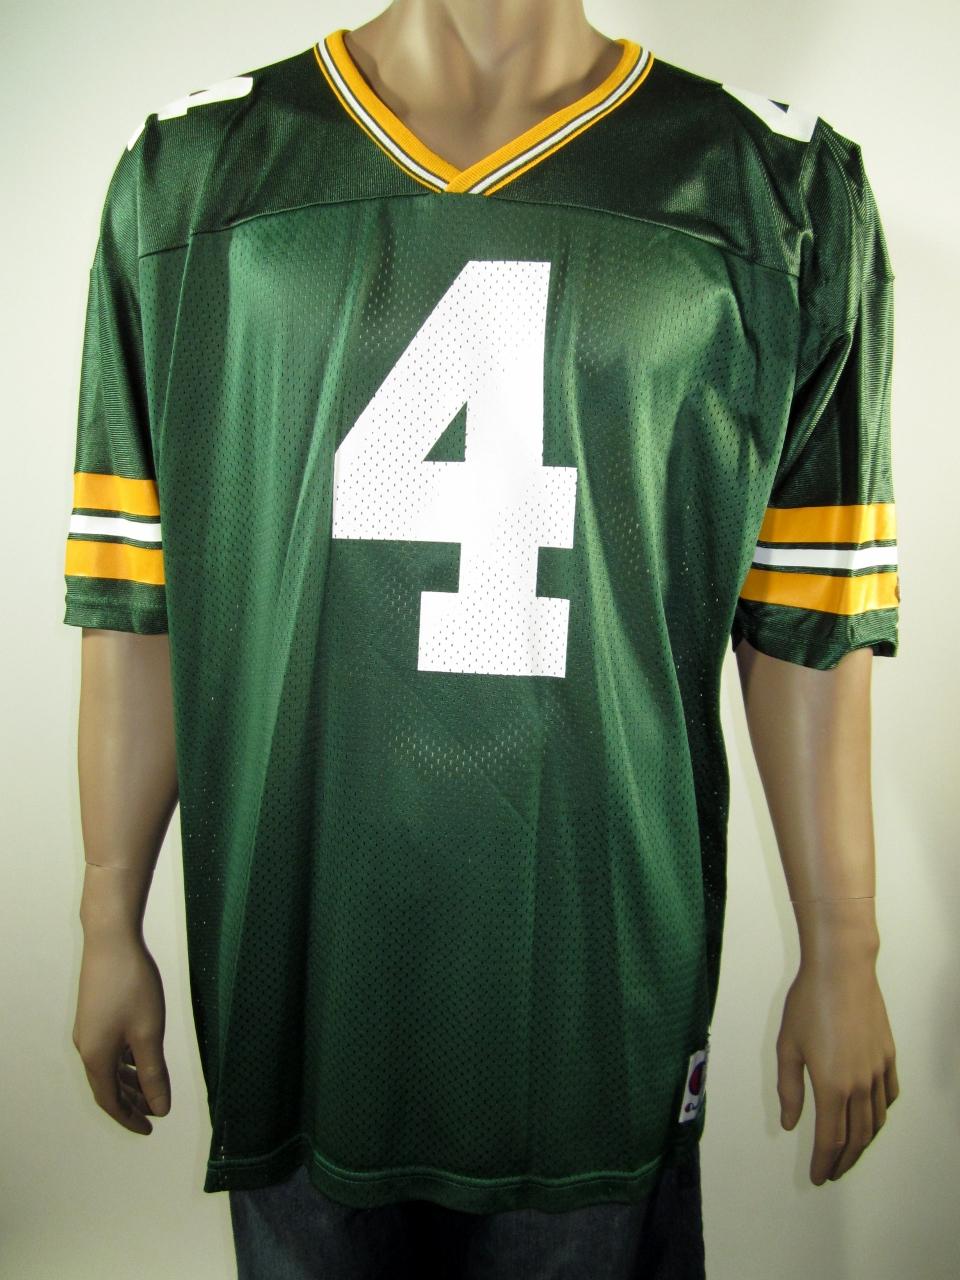 1c1552250e3 Brett Favre Green Bay Packers NFL Champion Jersey 52 NWT · DFRNSH8 ...